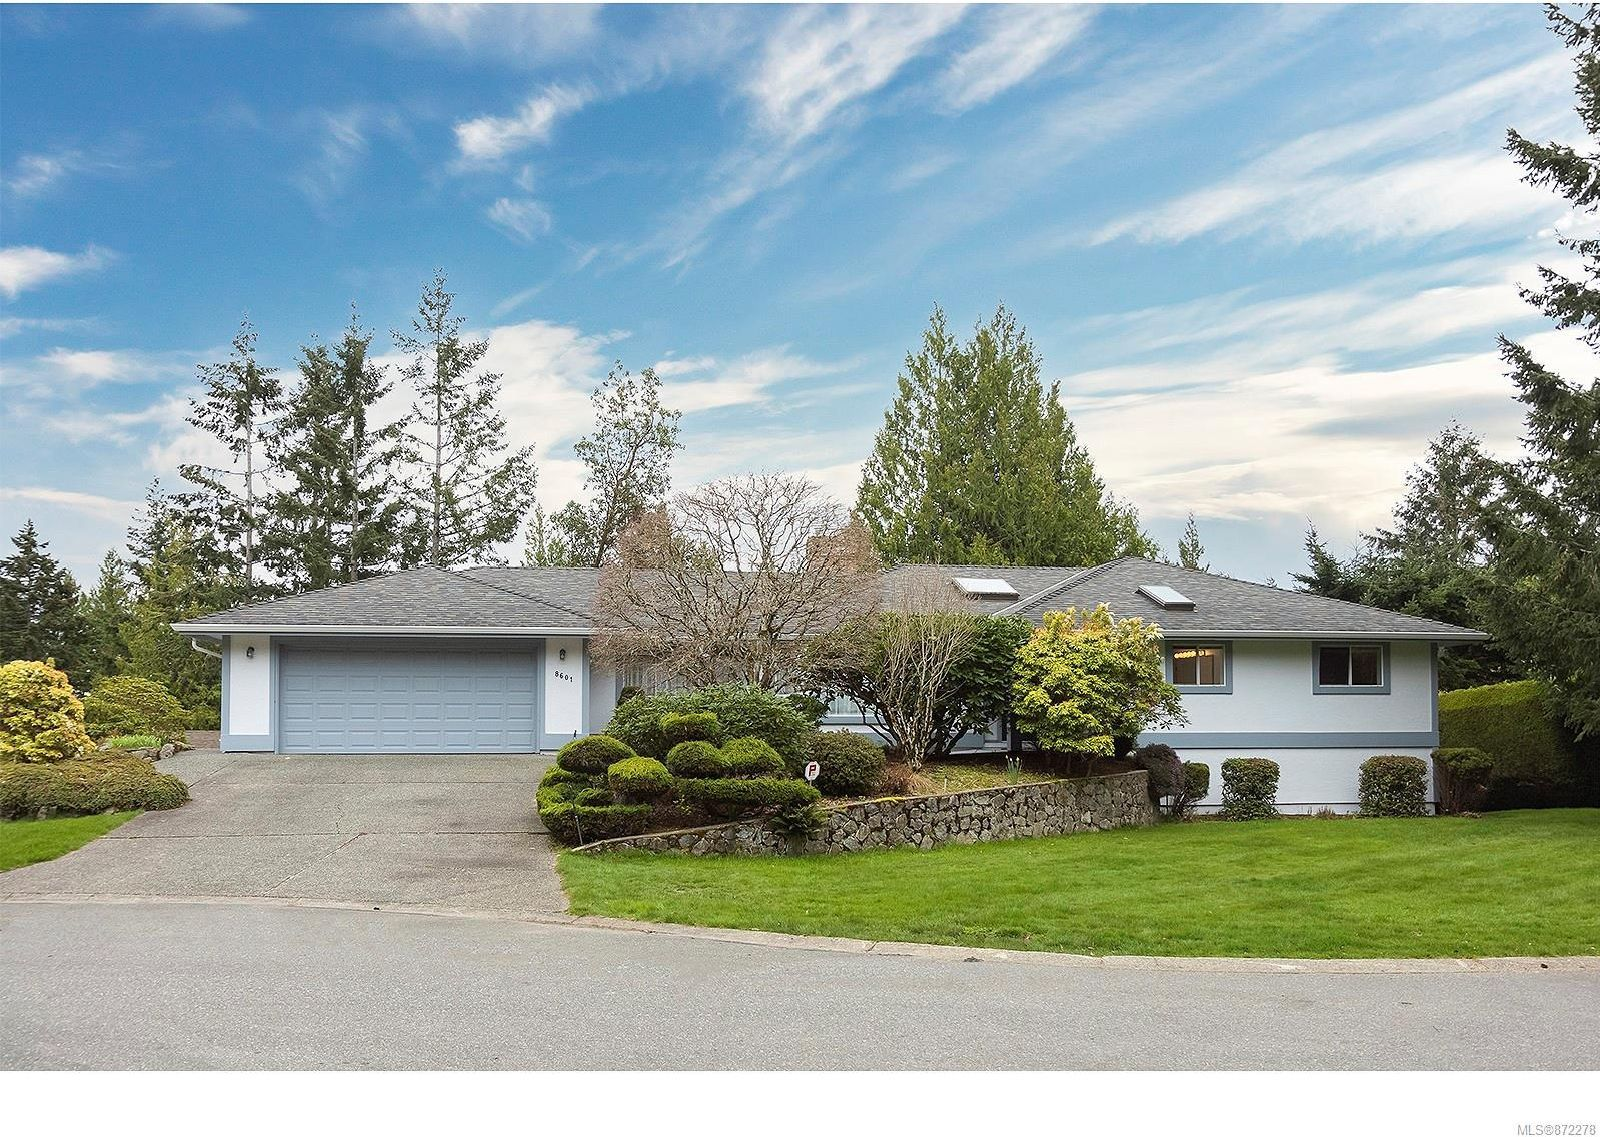 Main Photo: 8601 Deception Pl in : NS Dean Park House for sale (North Saanich)  : MLS®# 872278